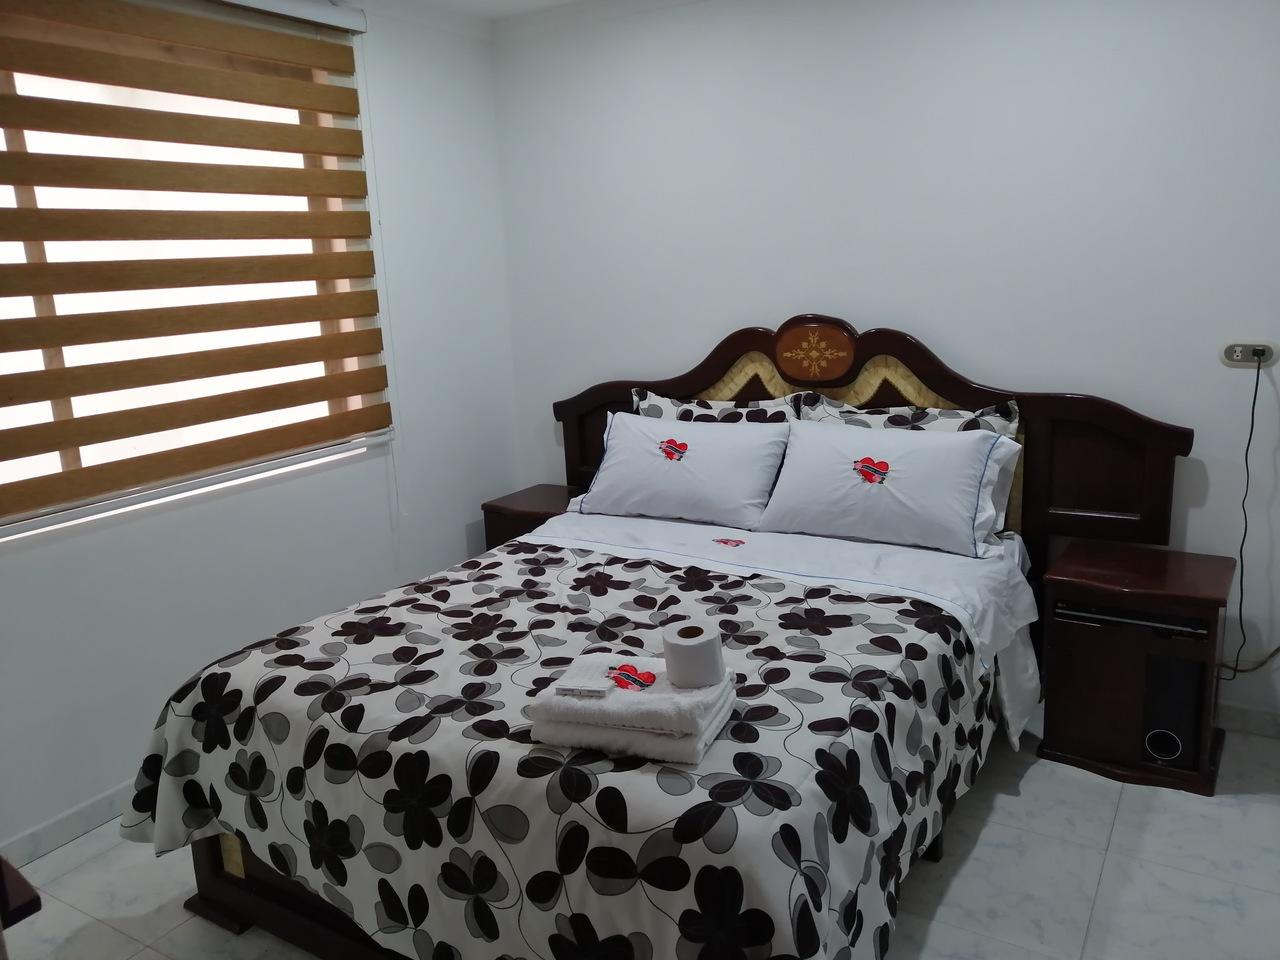 Habitación Jacuzzi en Risort Suite : MotelNow